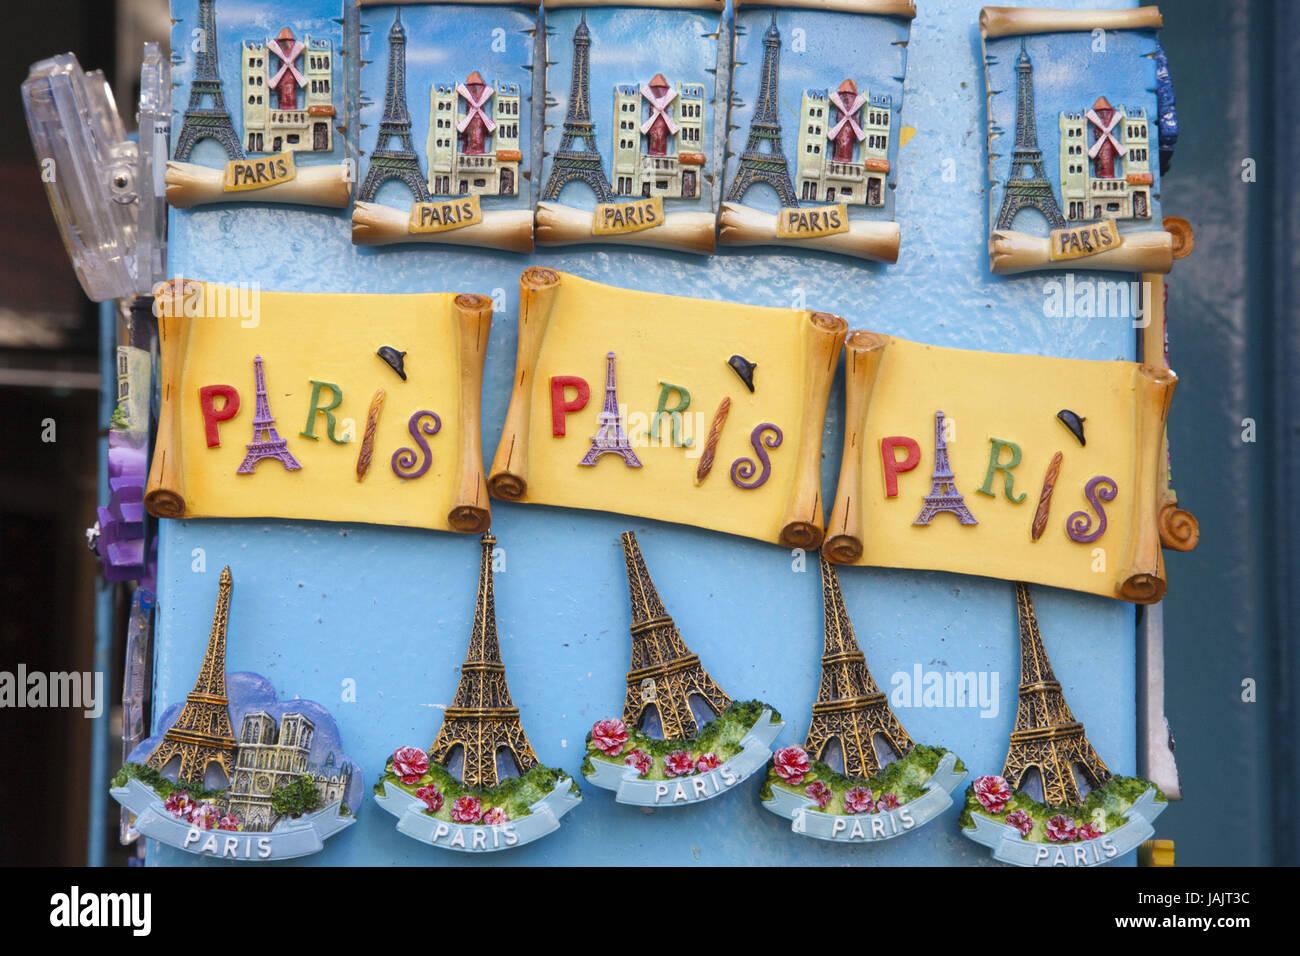 Francia,Parigi,souvenir,magneti per il frigo,Parigi luoghi di interesse, Foto Stock